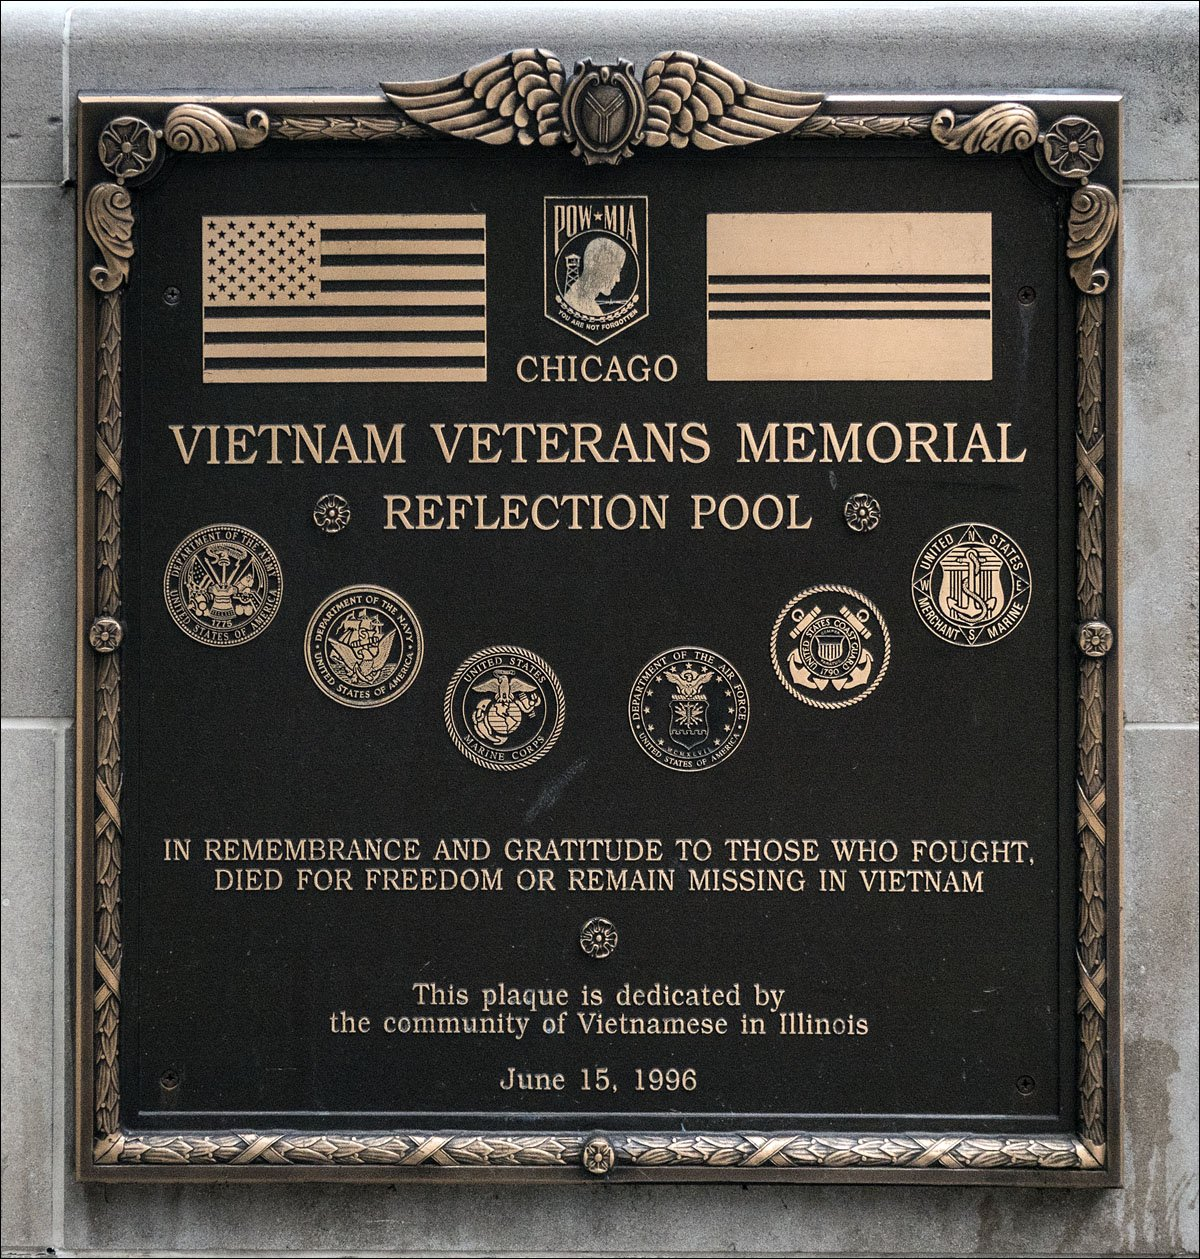 Chicago Vietnam Veterans Memorial